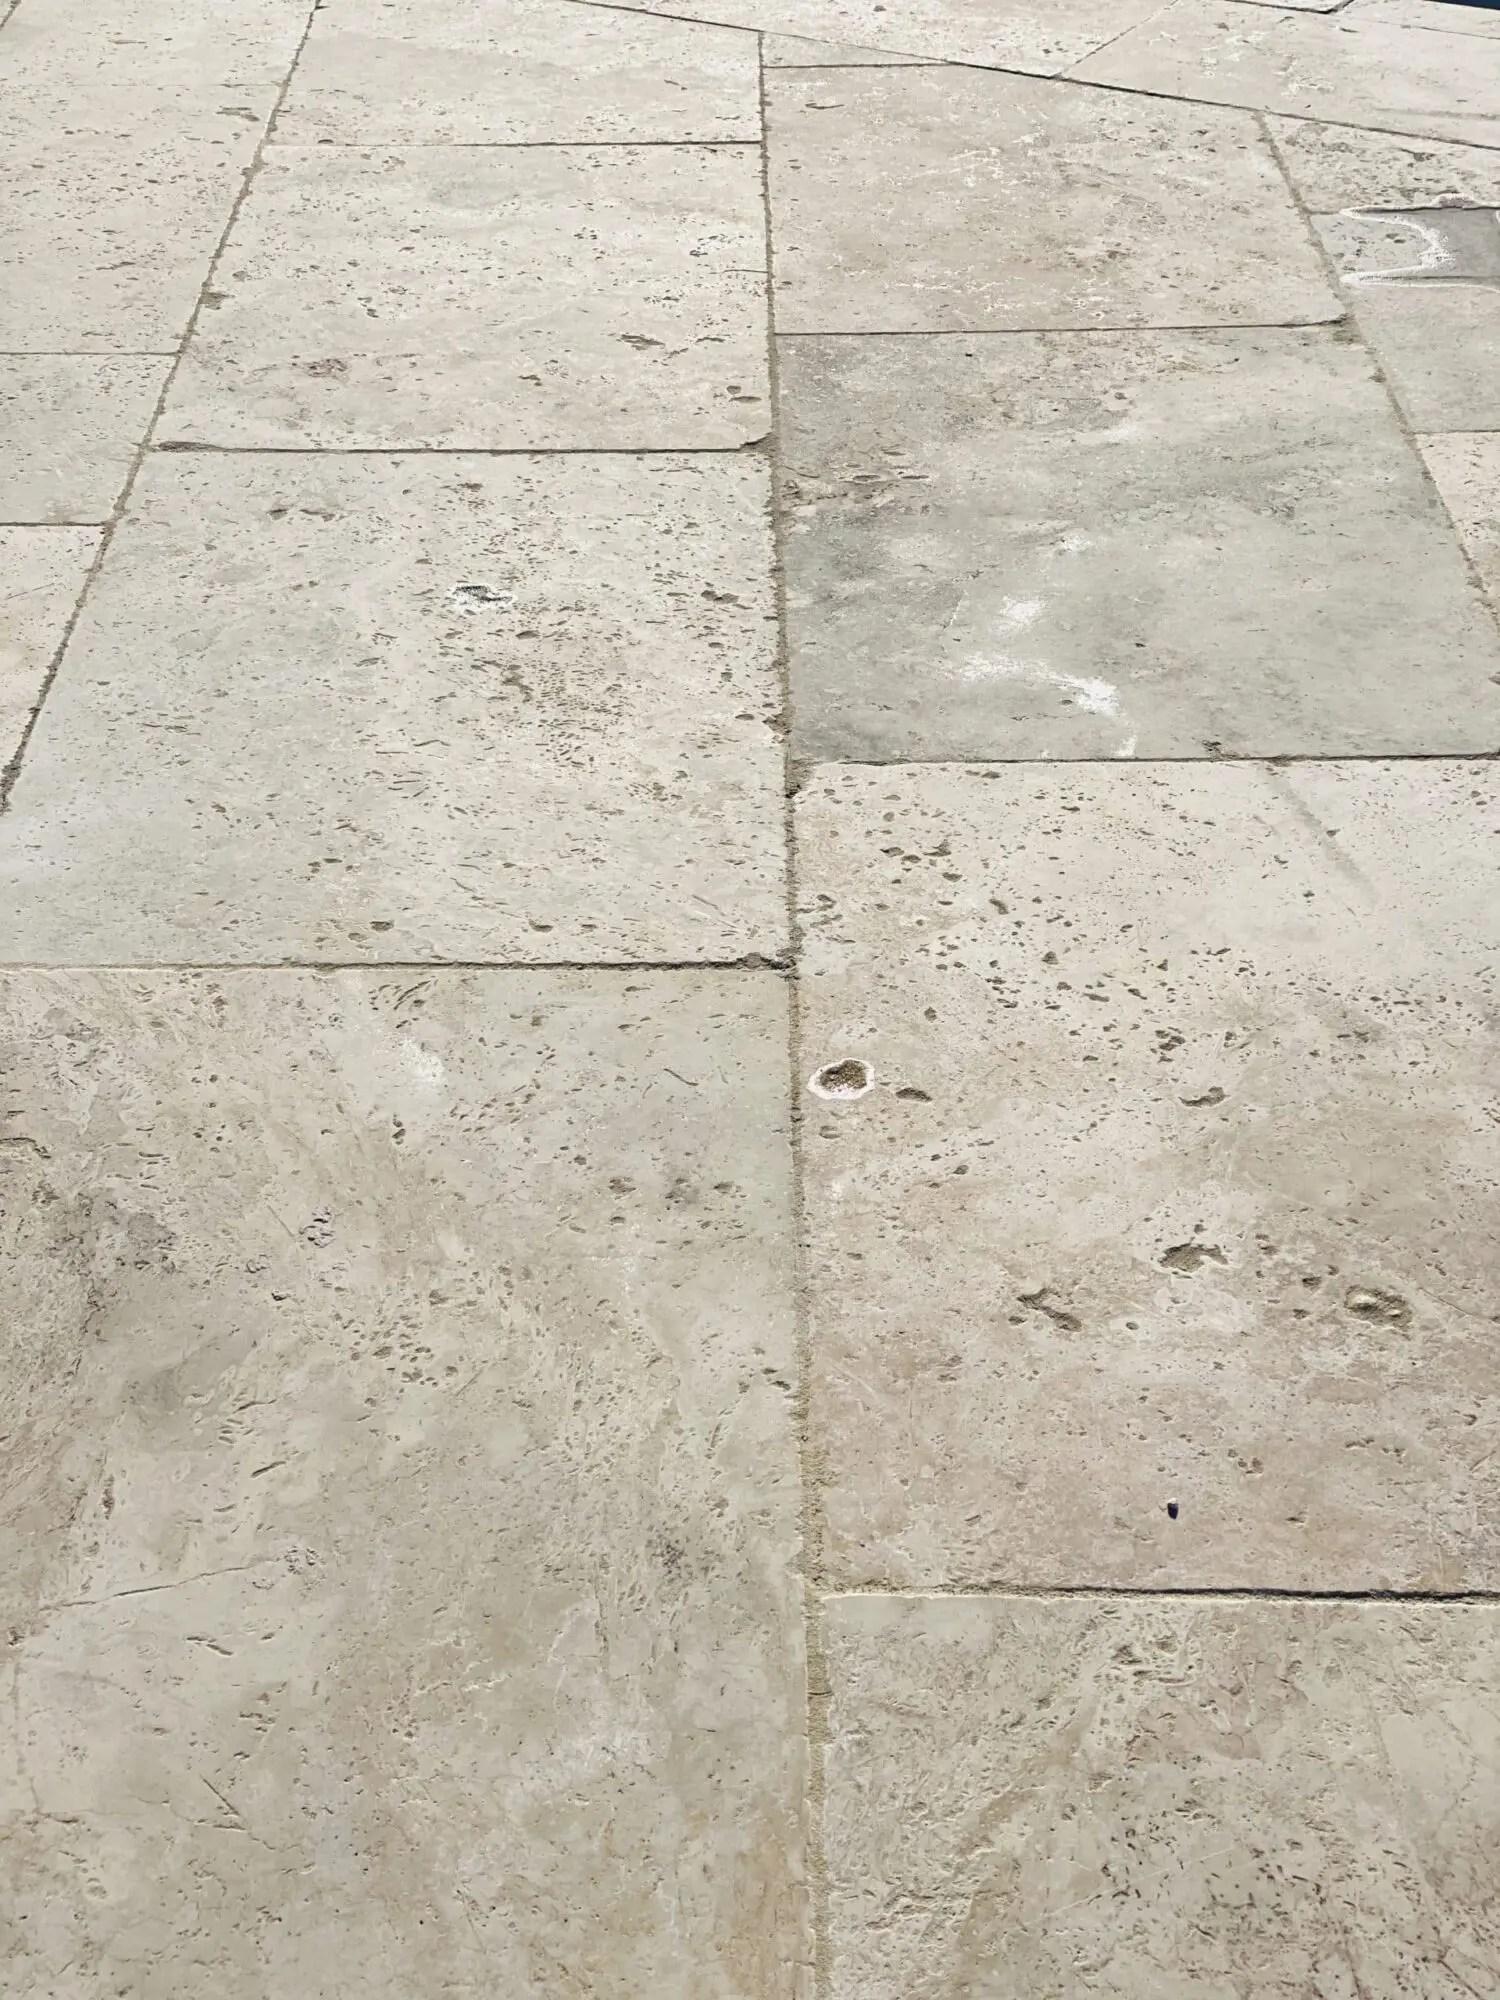 arrivage massif travertin 60x90 cm pierre naturelle